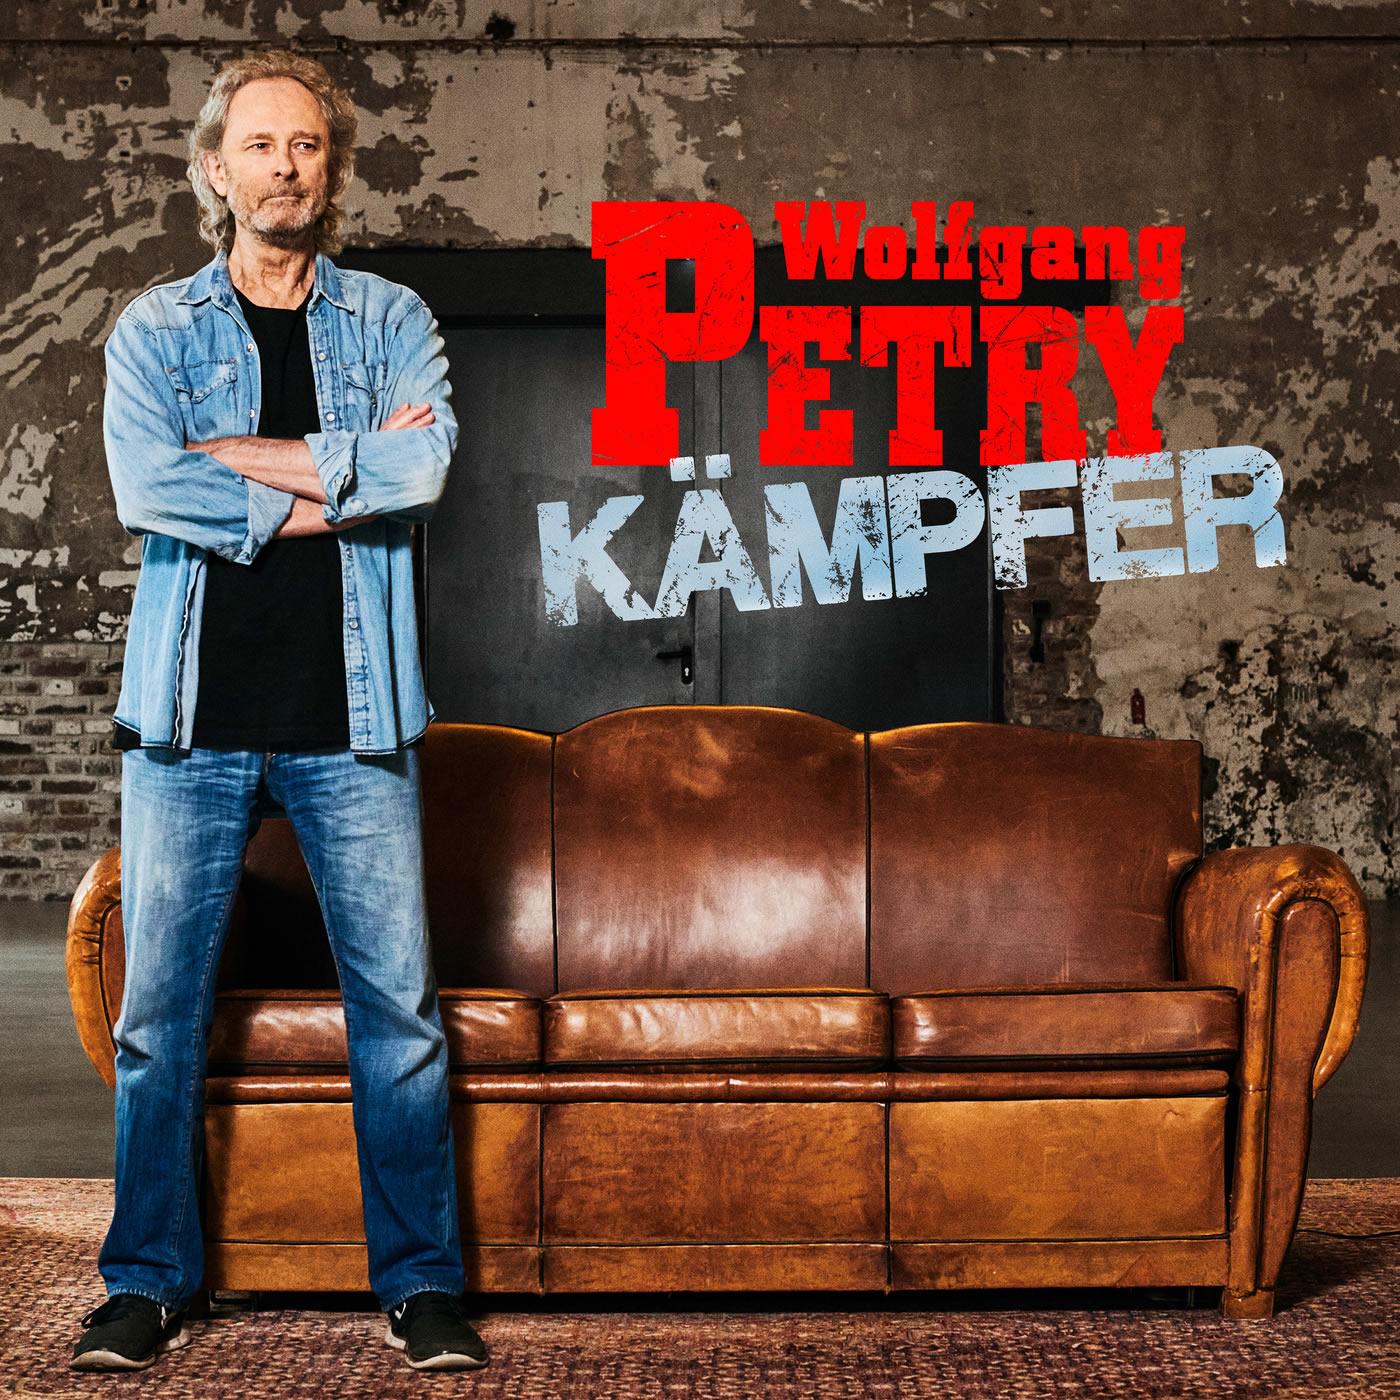 Wolfgang Petry - Kämpfer (2021)